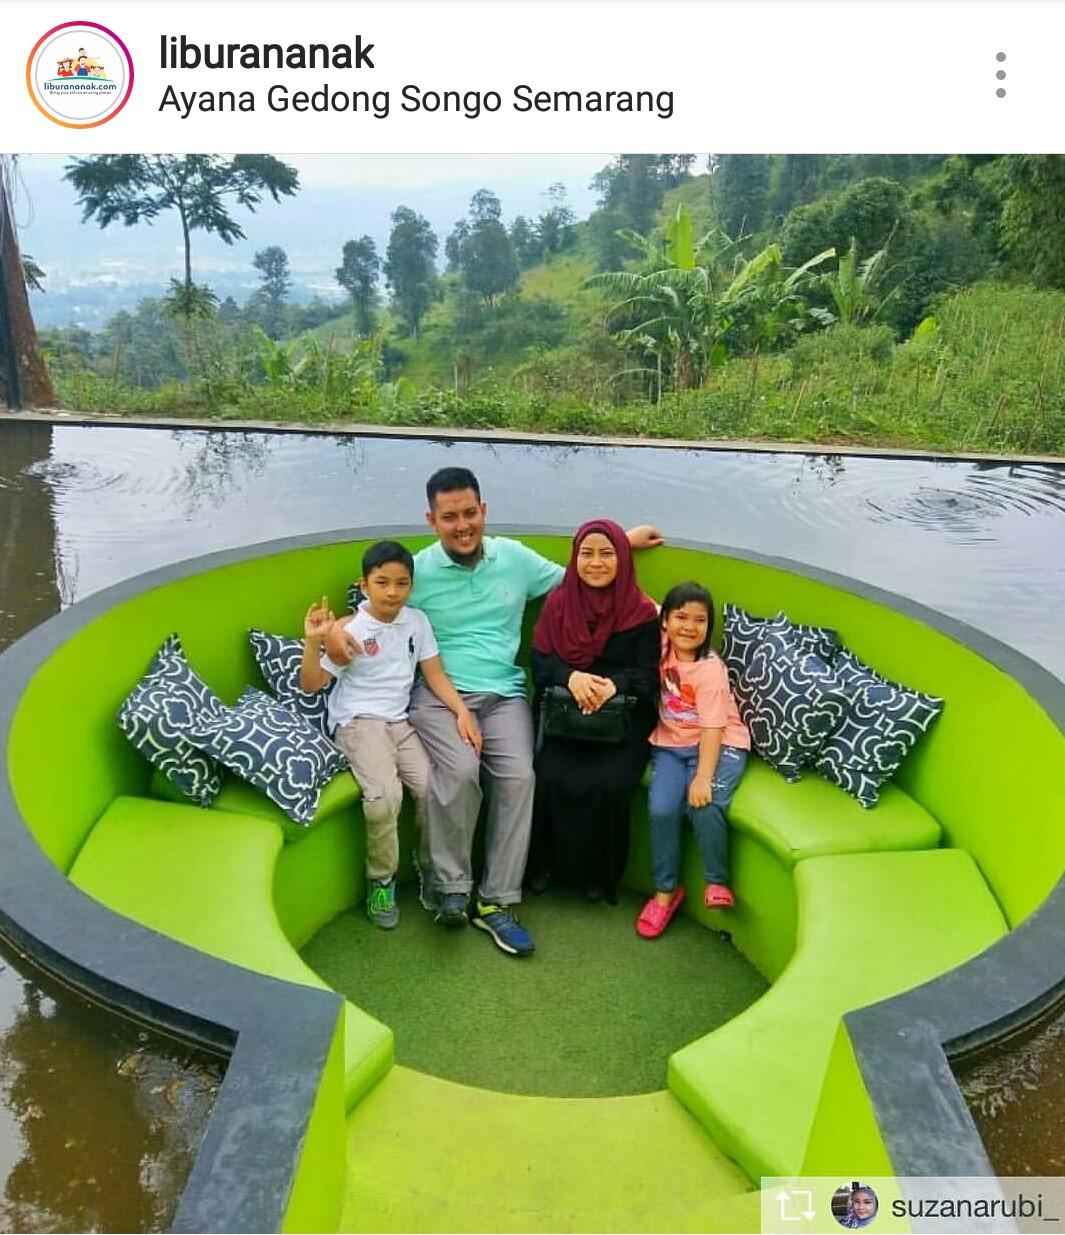 Ayana Gedong Songo Semarang Kids Holiday Spots Liburan Anak